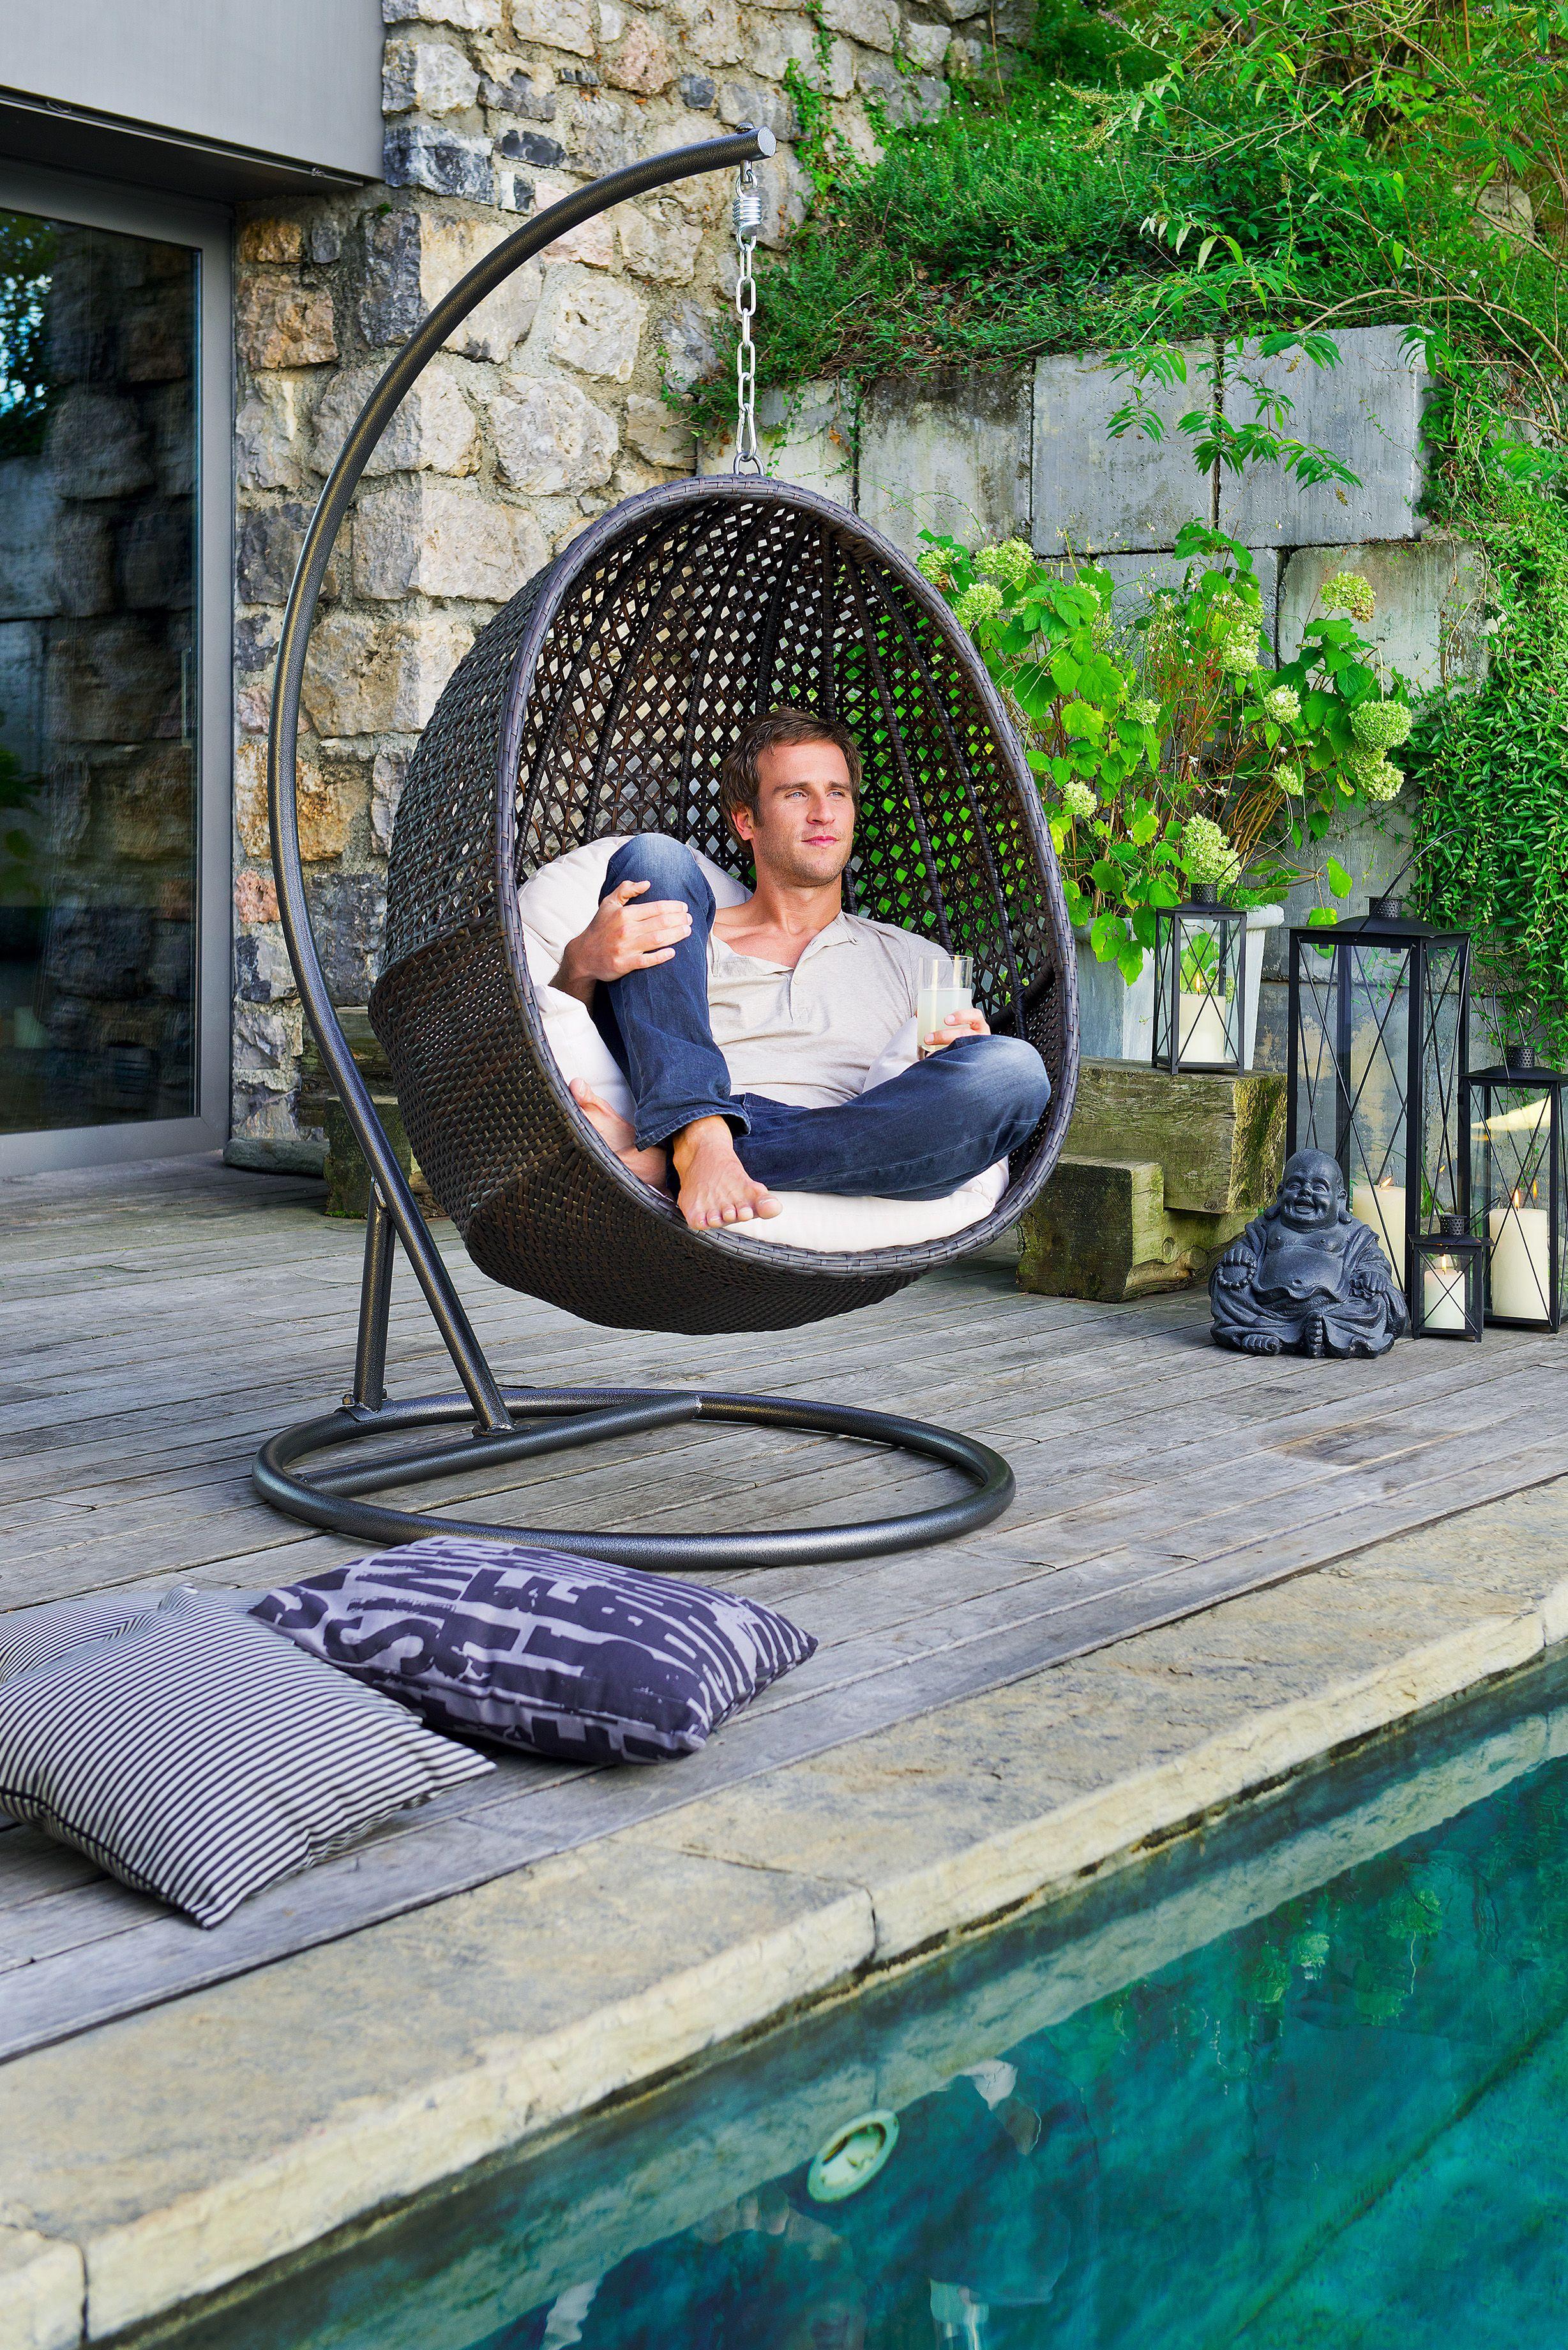 einfach mal abh ngen der geflecht h ngesessel l dt ein. Black Bedroom Furniture Sets. Home Design Ideas